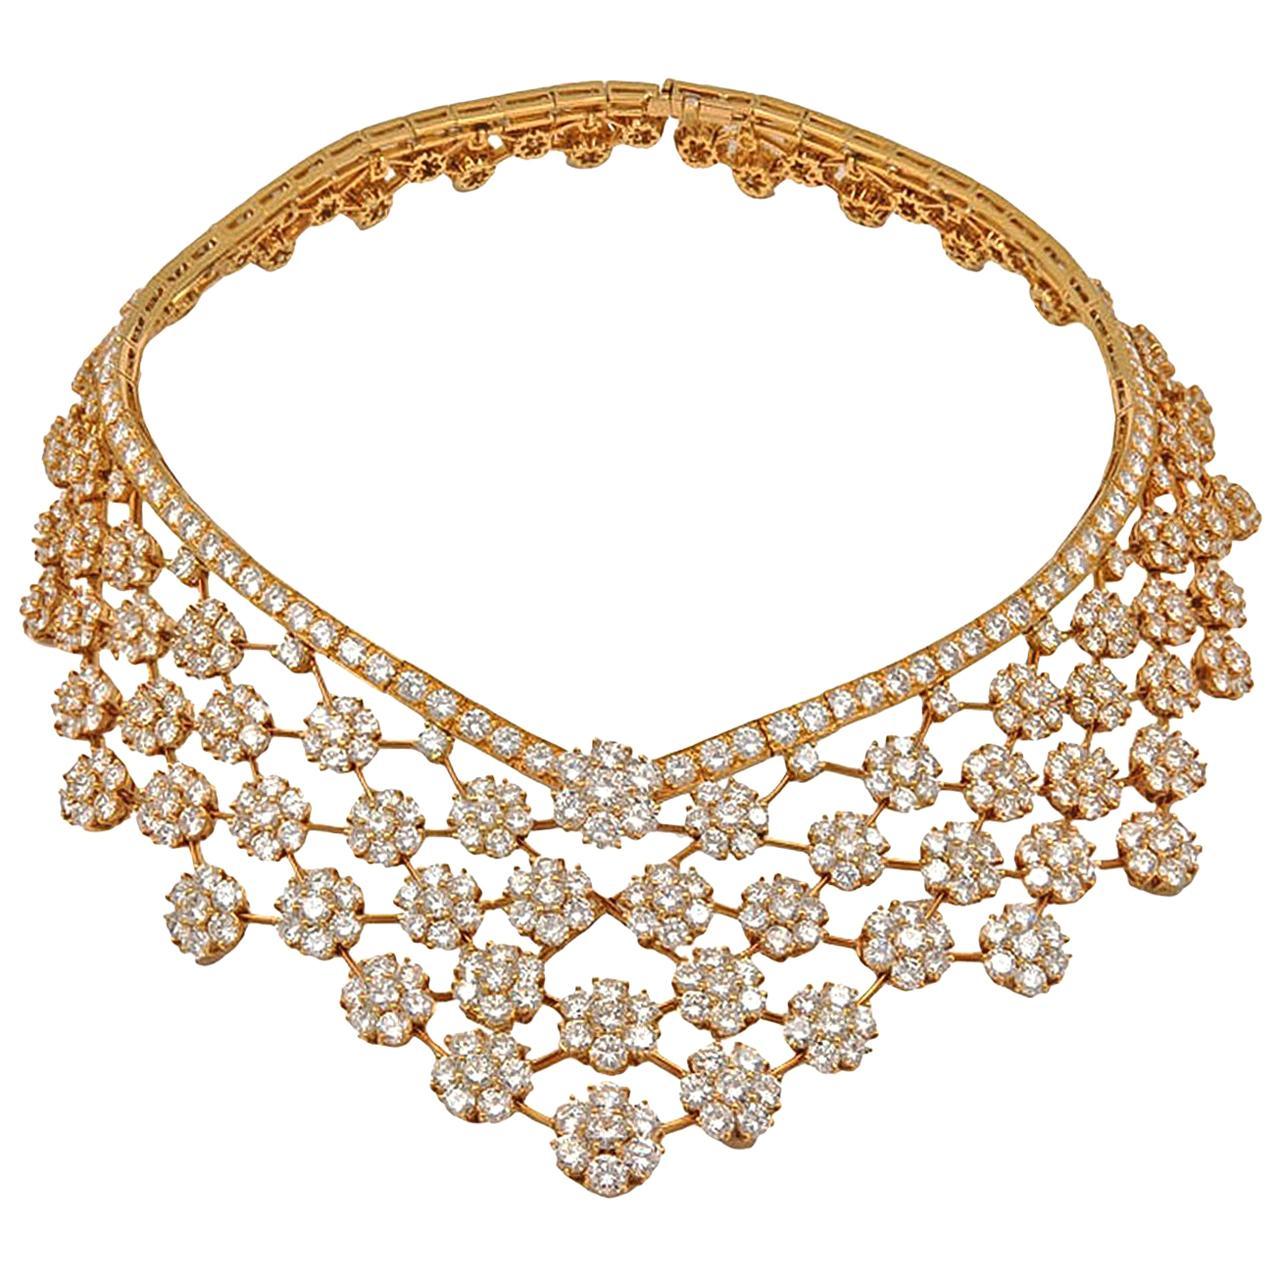 Van Cleef & Arpels Diamond 75 Carat Snowflakes Necklace